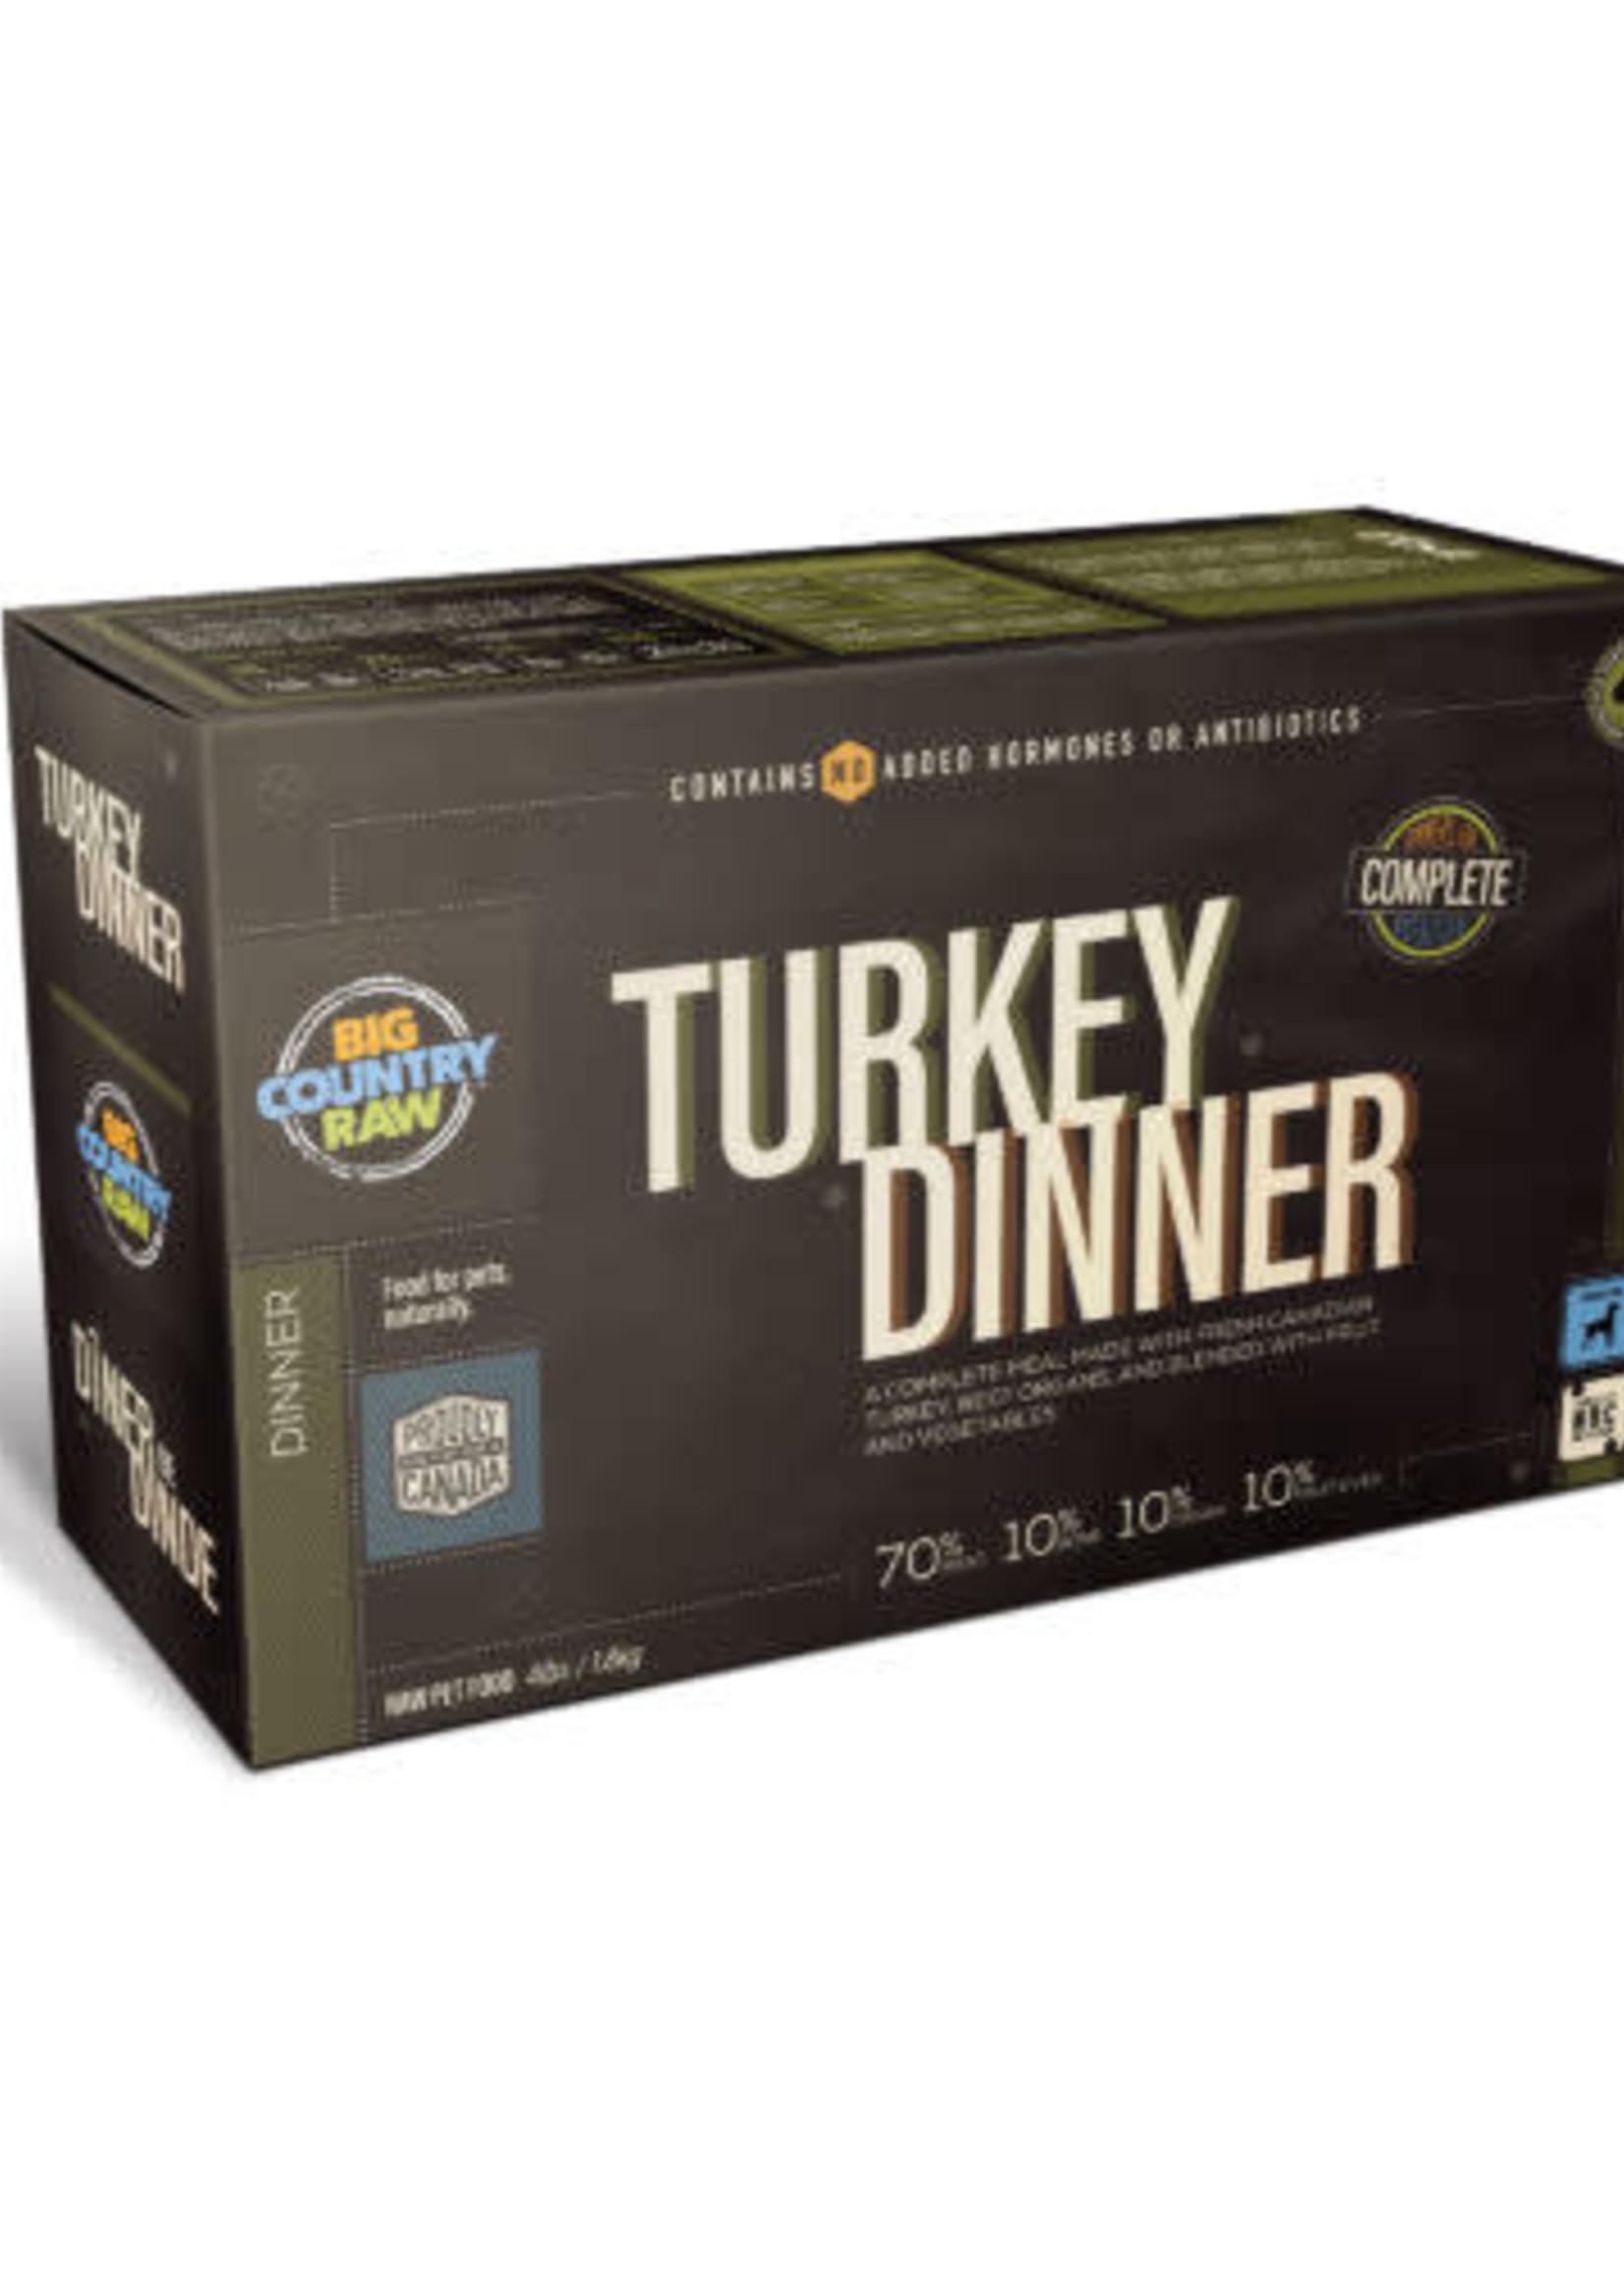 Big Country Raw Big Country Raw Turkey Dinner 4x1lb